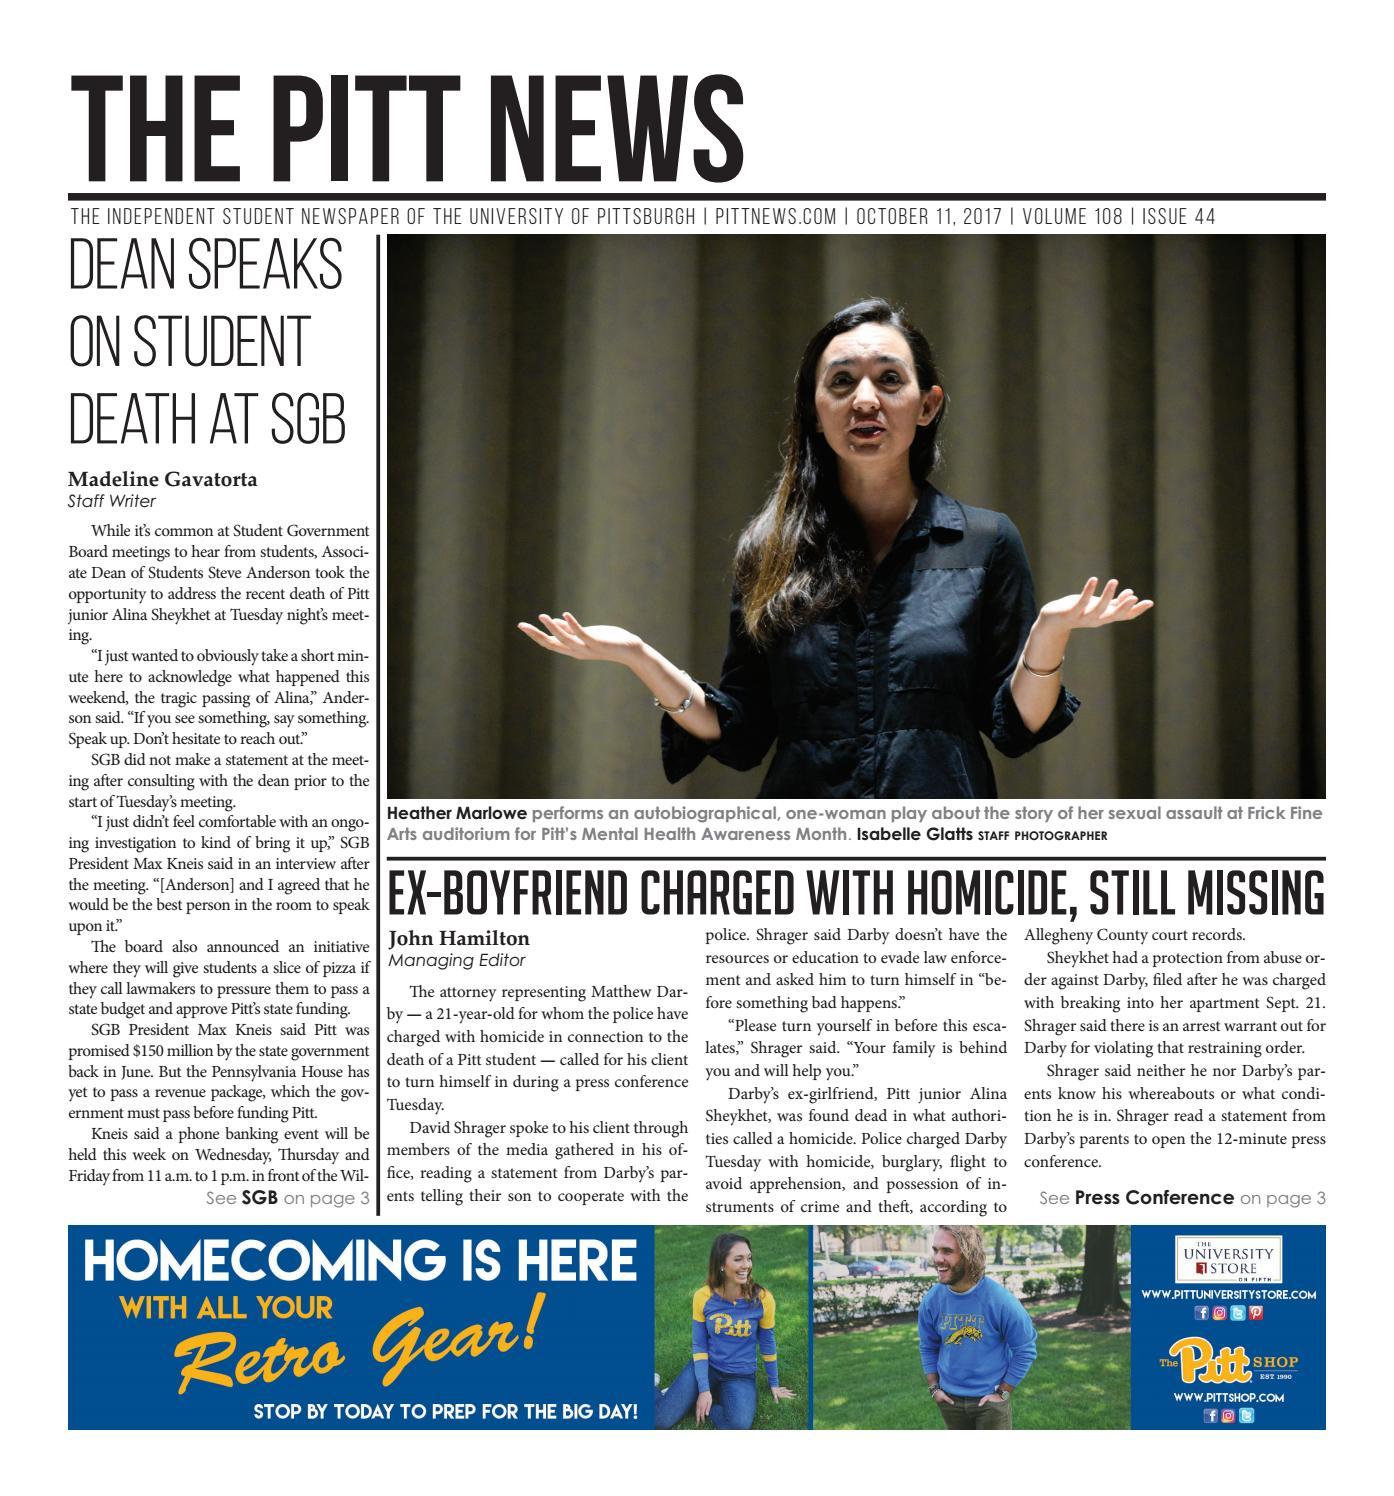 10-11-17 by The Pitt News - issuu